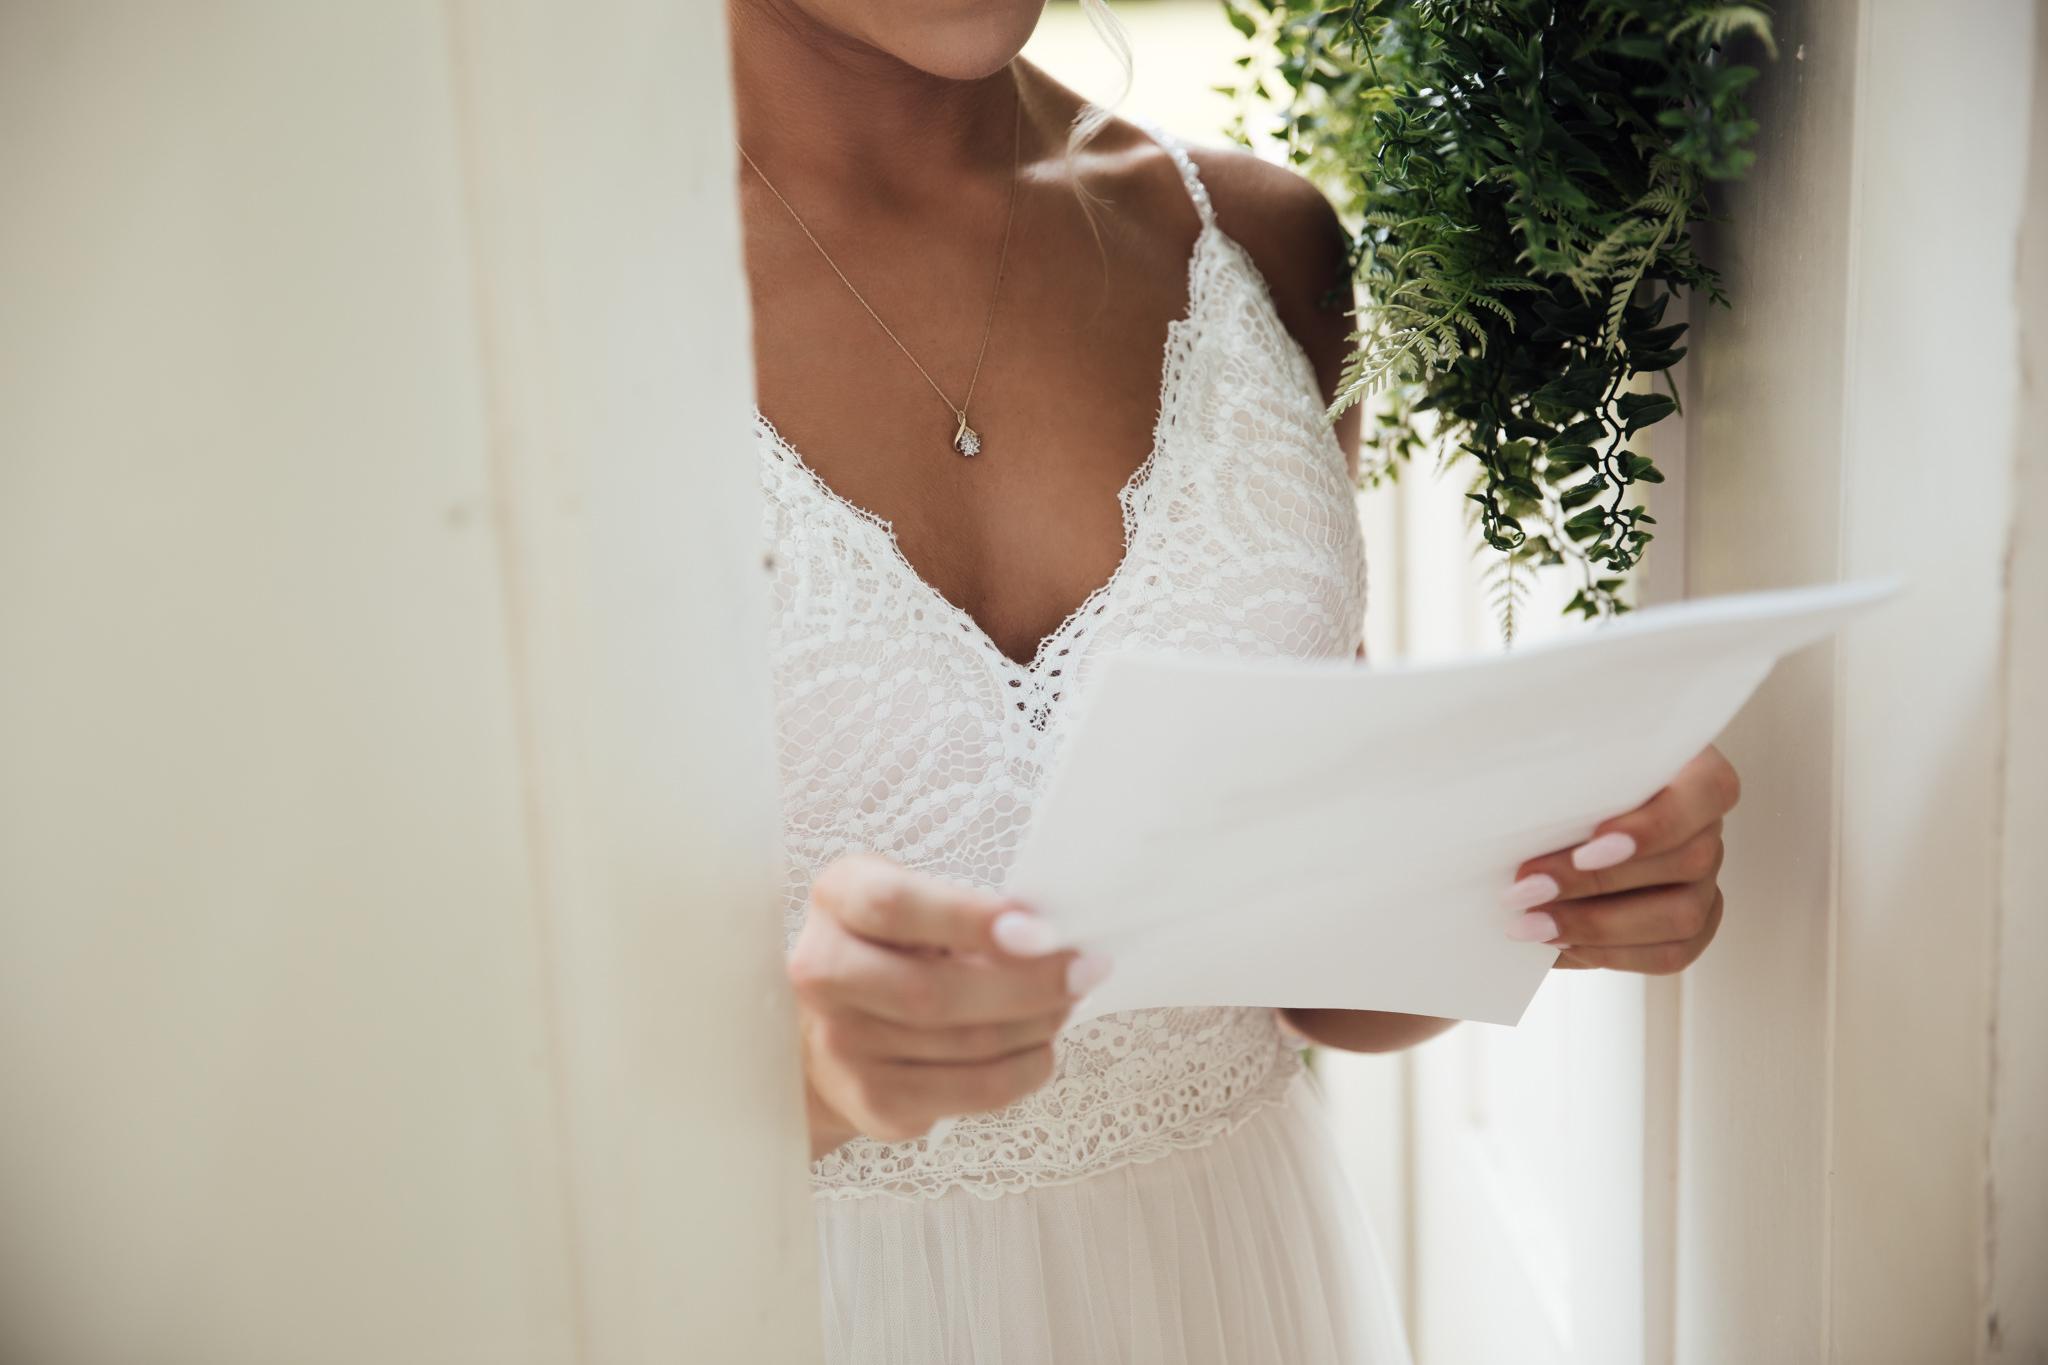 backyard-wedding-thewarmtharoundyou-lexy-branson-26.jpg